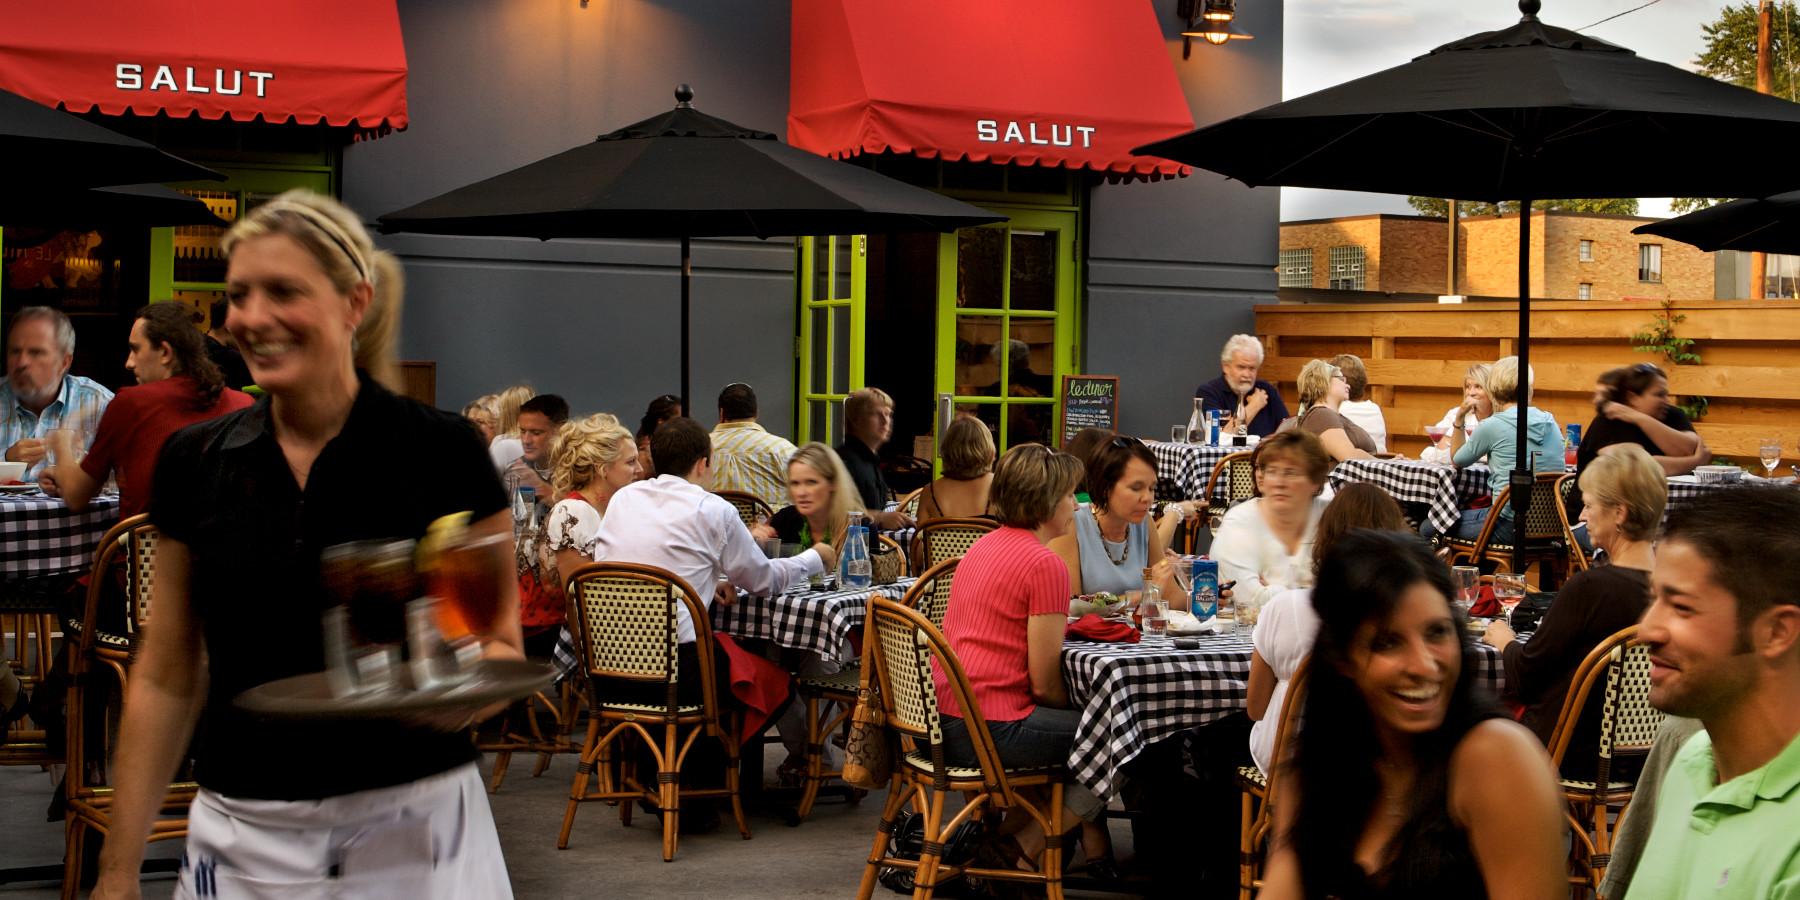 Salut | Bar Americain 50th and France Restaurants